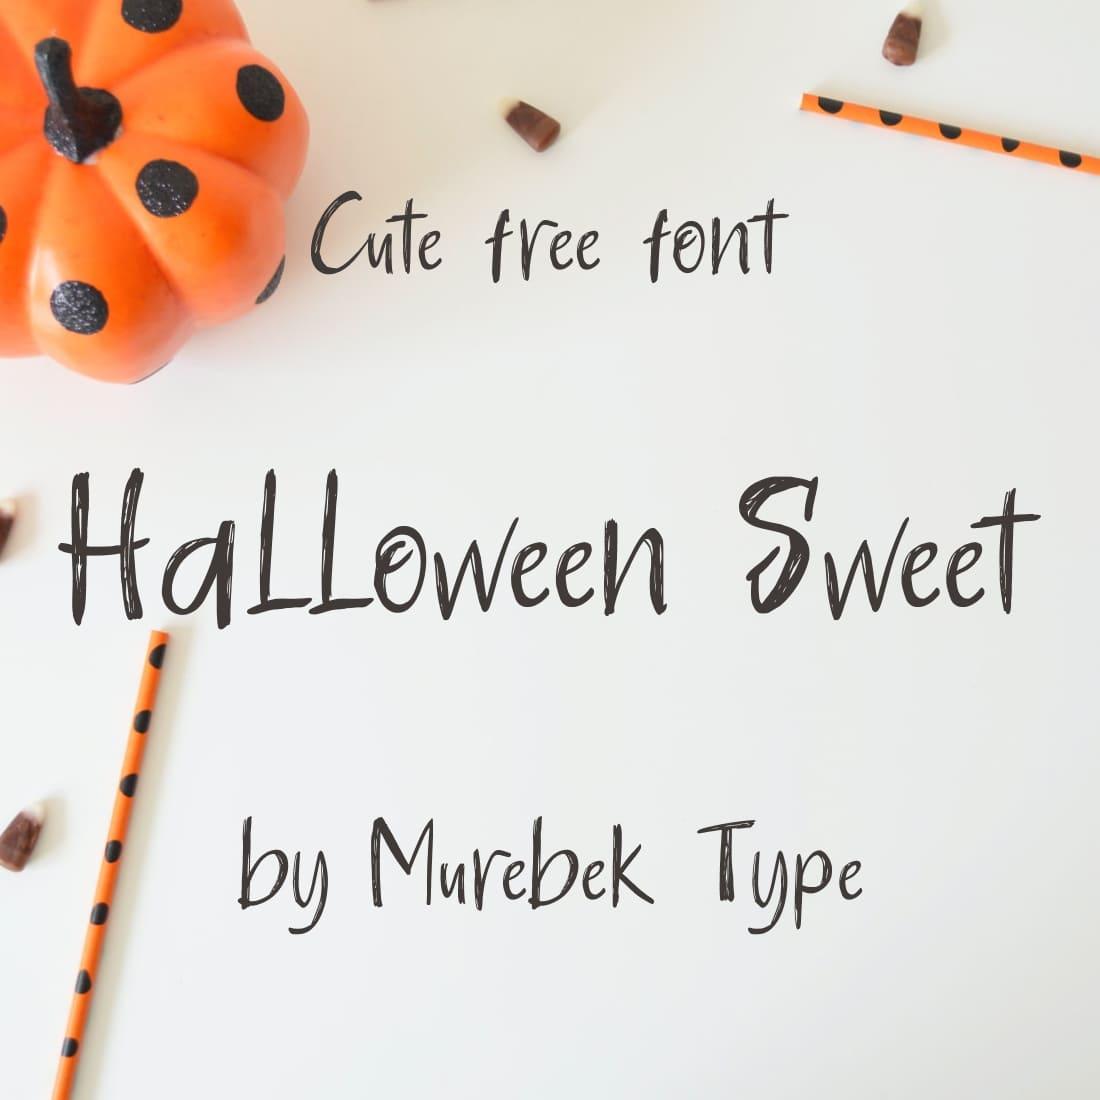 MasterBundles Cover Image for Halloween Sweet - cute free halloween font.